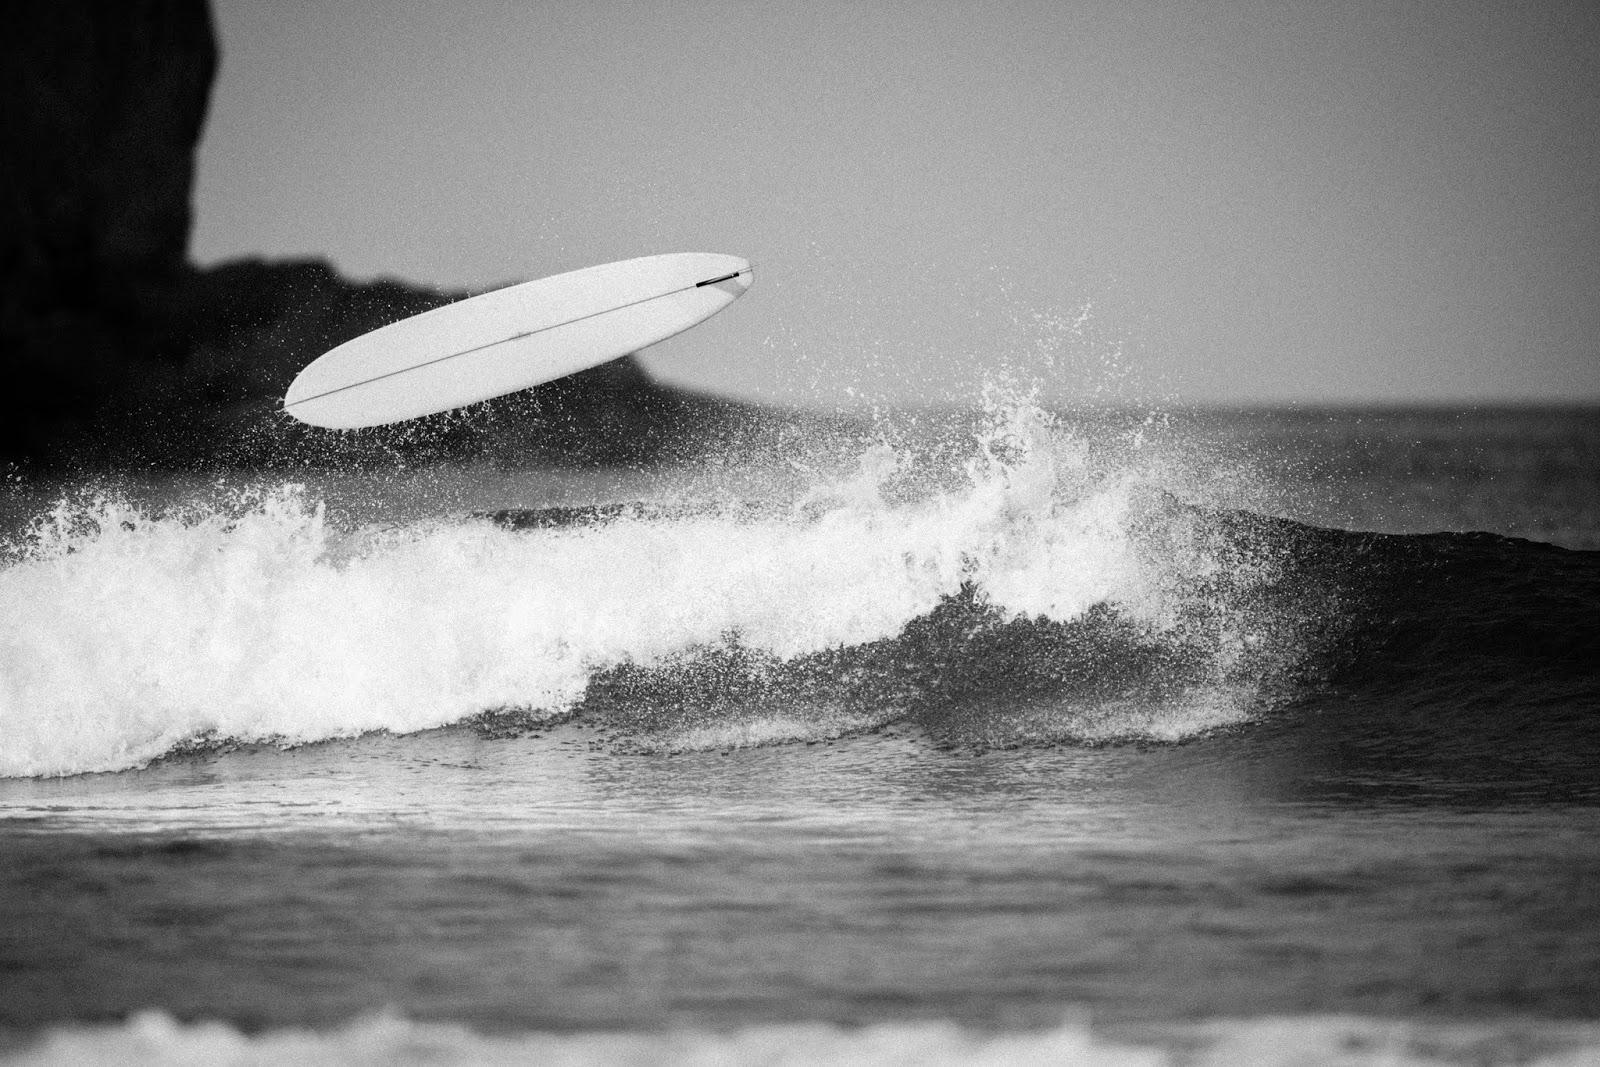 surfear sin invento leash